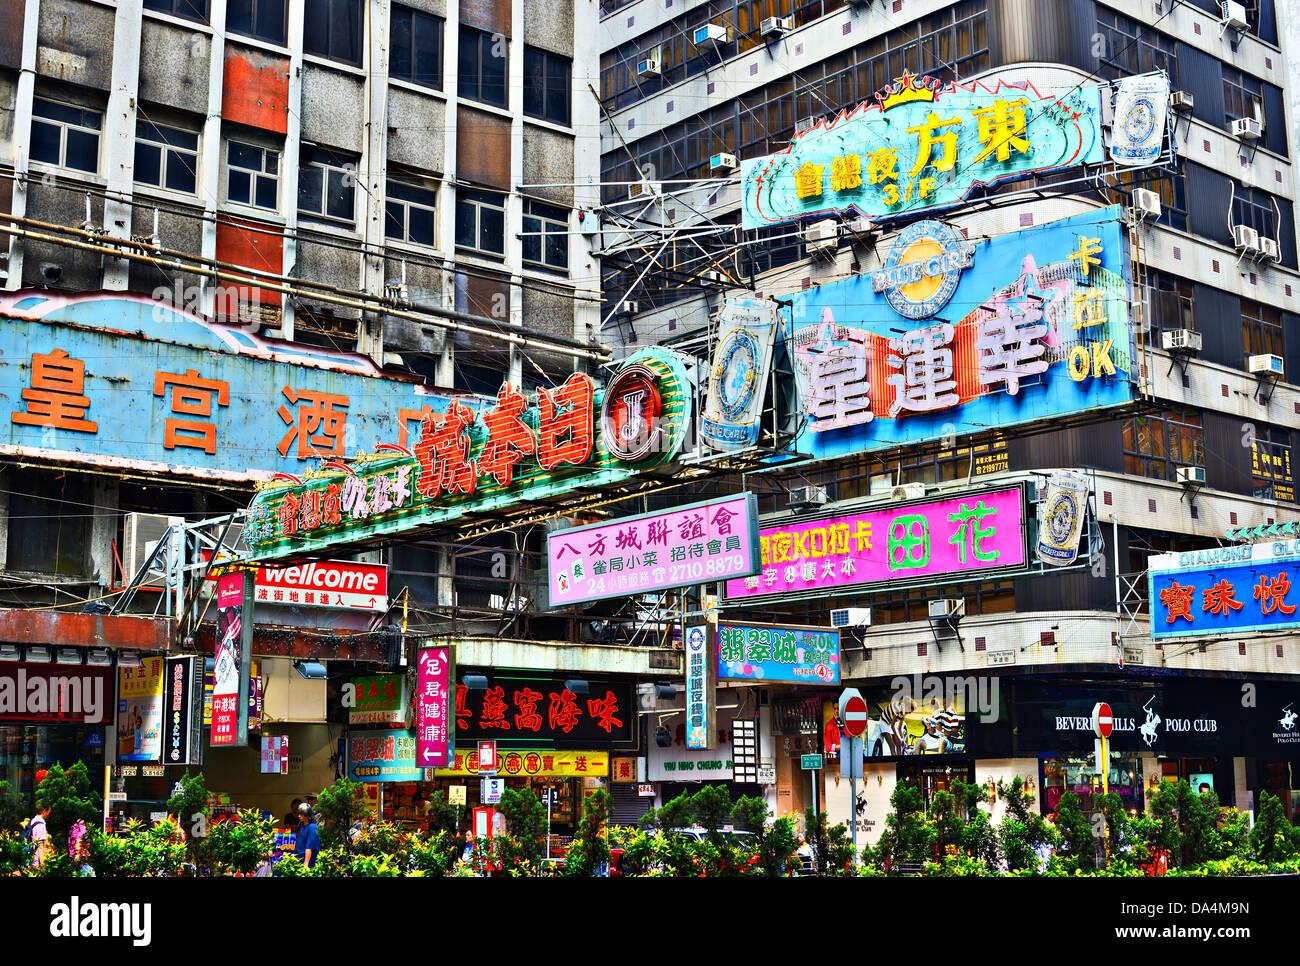 Billboards in Hong Kong - Stock Image